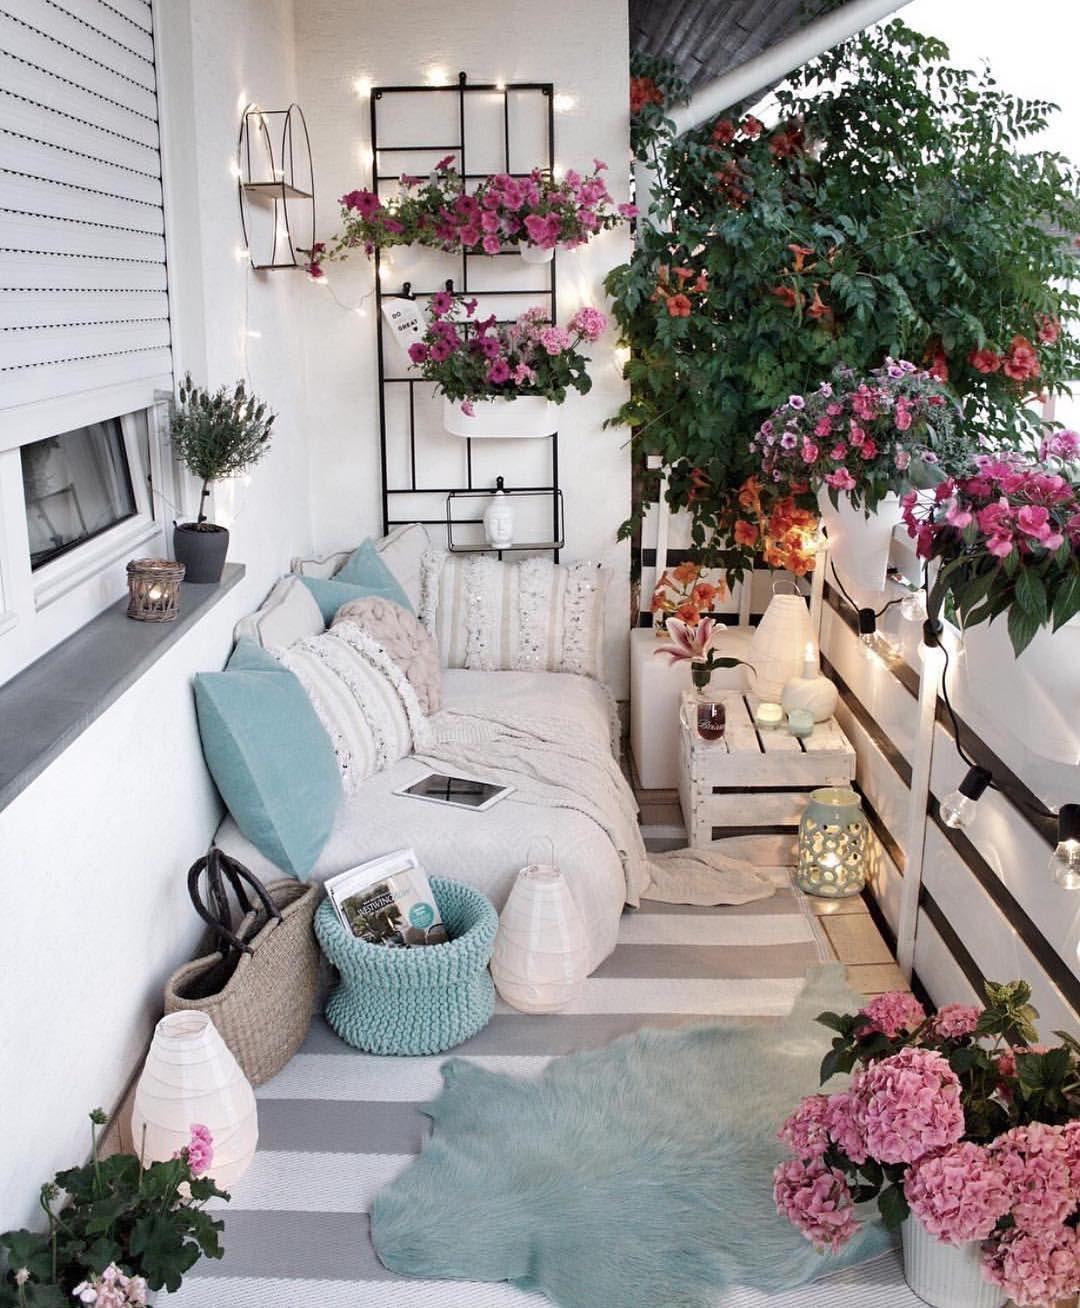 Cozy Night Via Hap Fashion By Gozdee81 Interiordesign Small